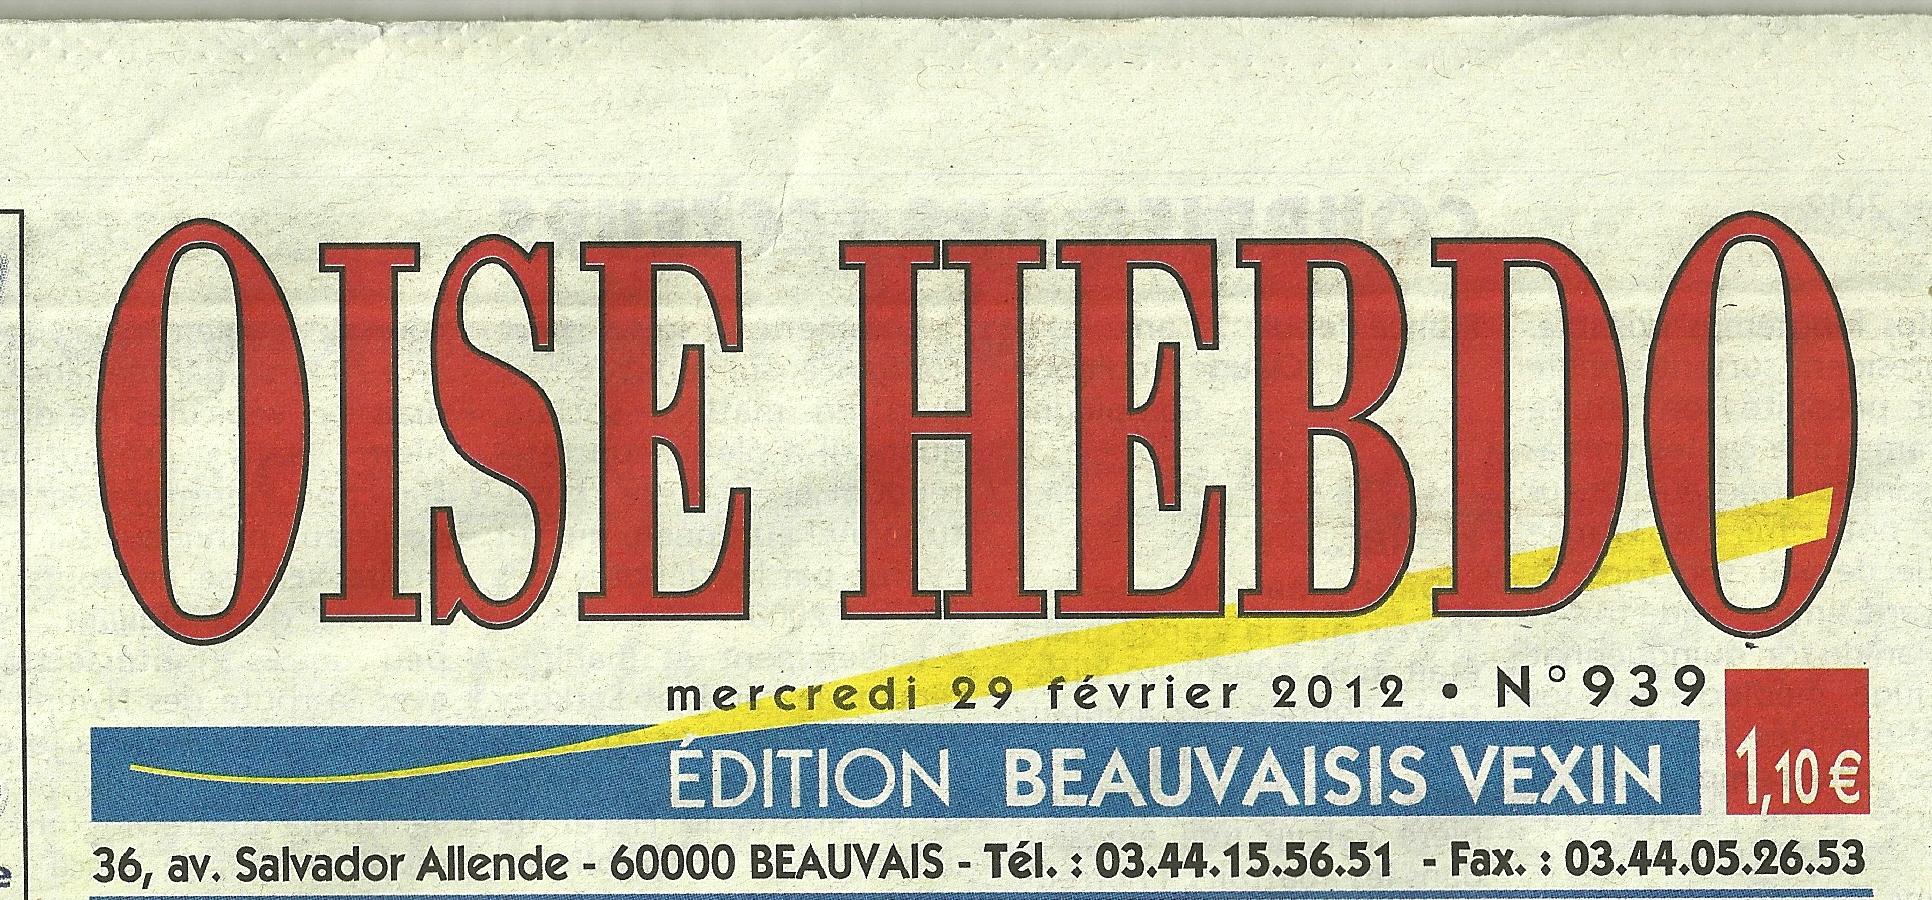 FFPA ARTICLE OISE HEBDO DU 29 02 2012 ENTETE0001